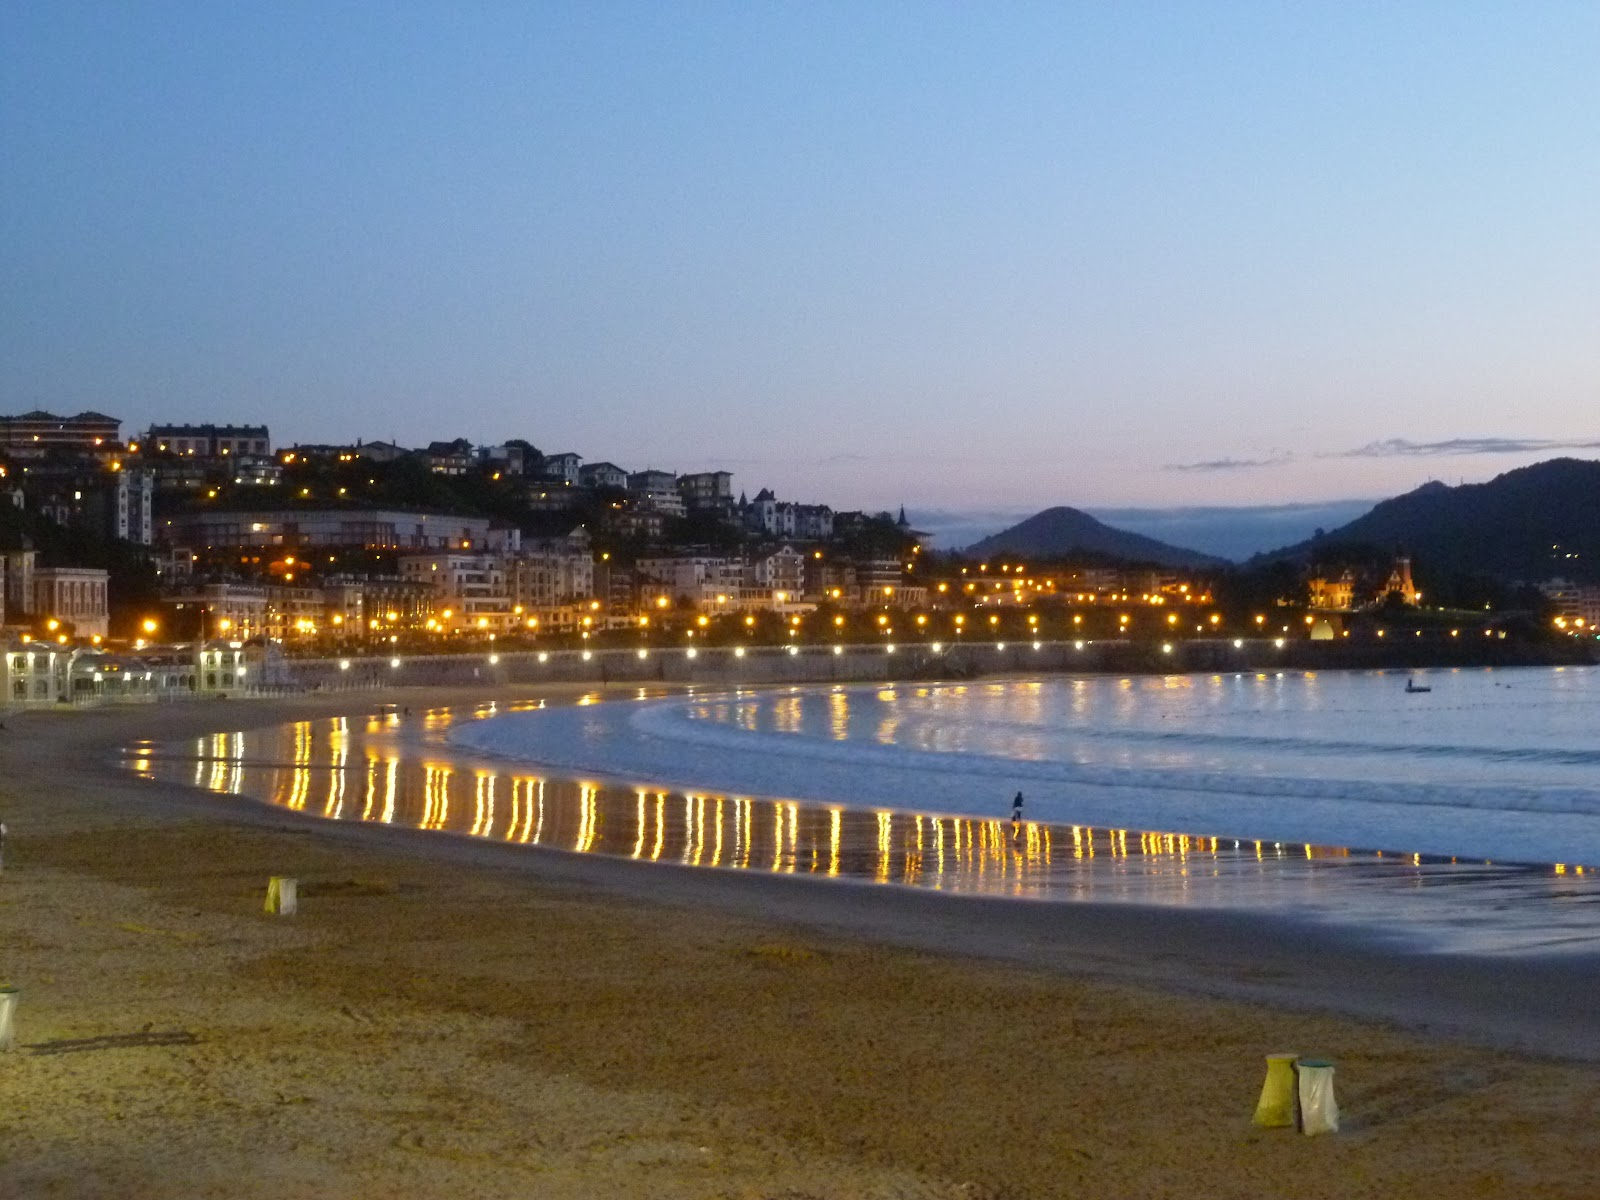 Denise M Hartman Weekend At The Beach San Sebastian Spain